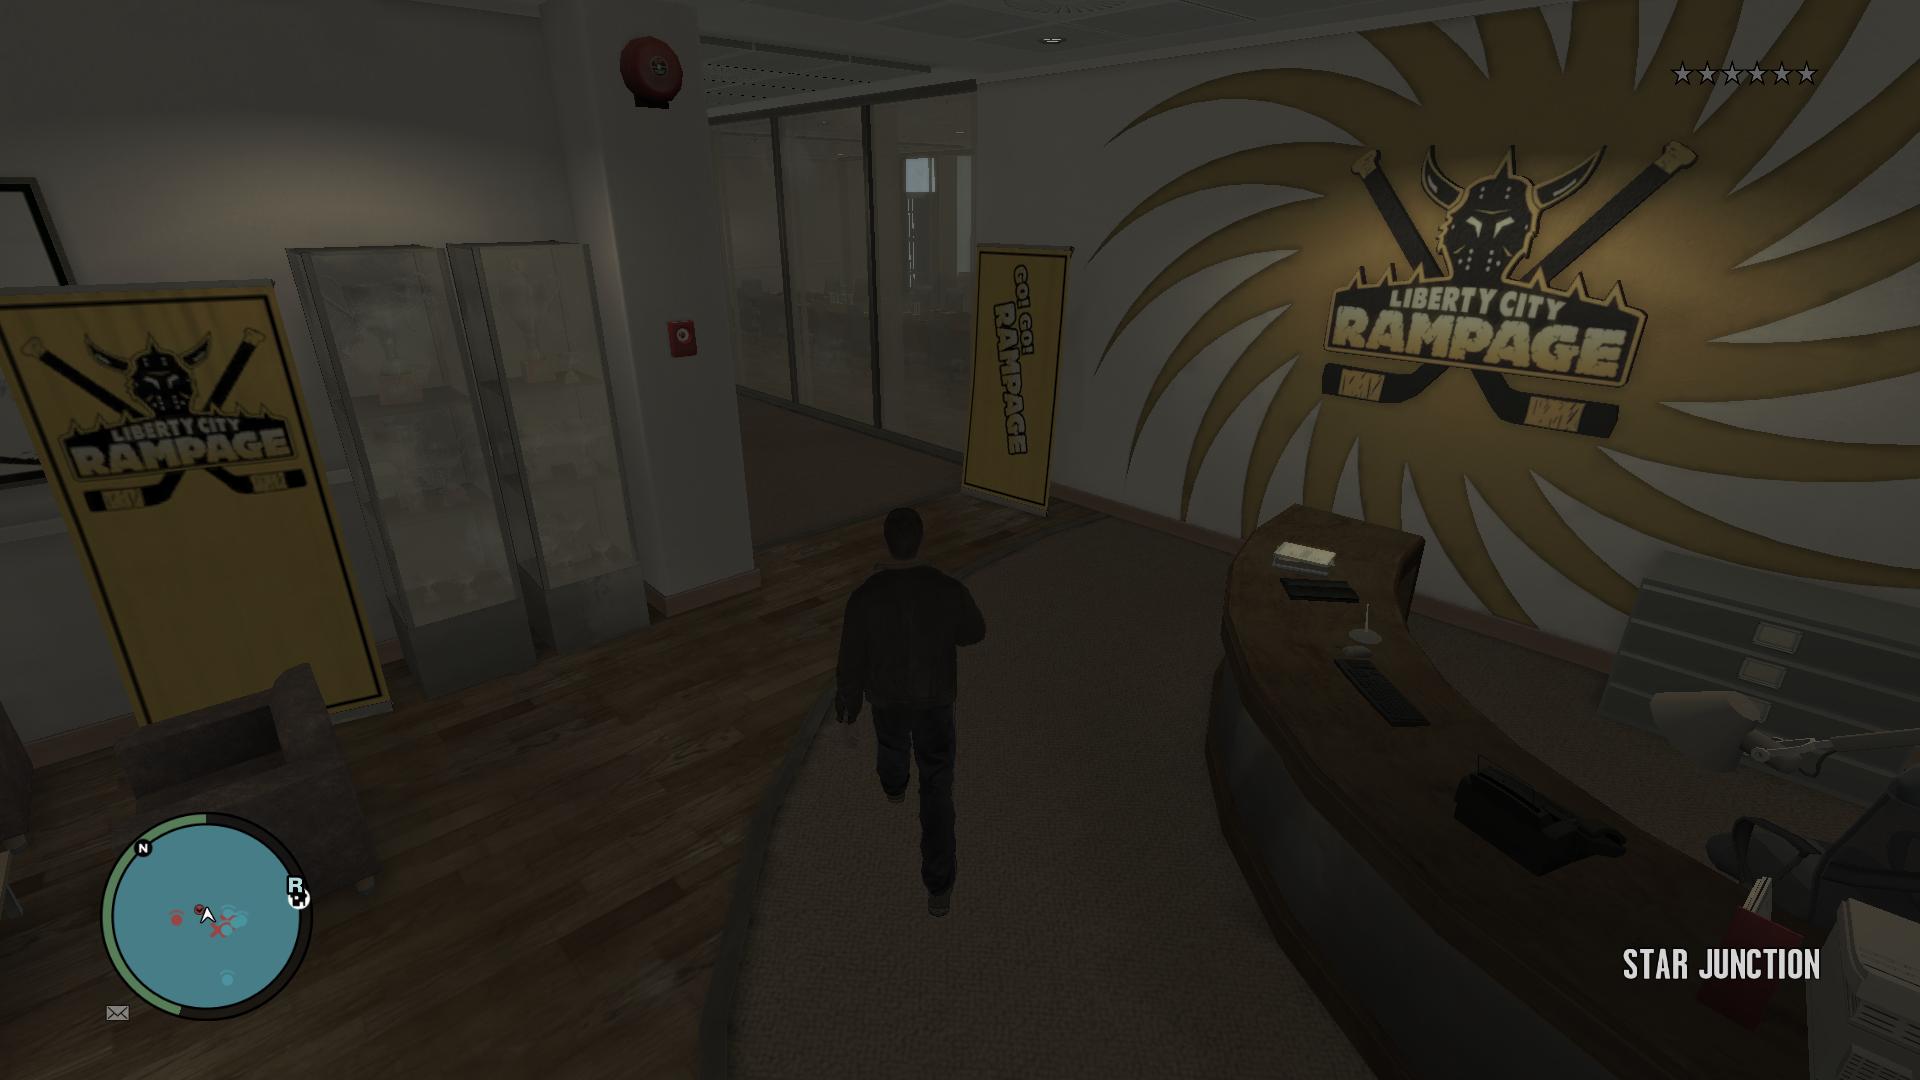 Grand-Theft-Auto-4-Screenshot-2020-08-01